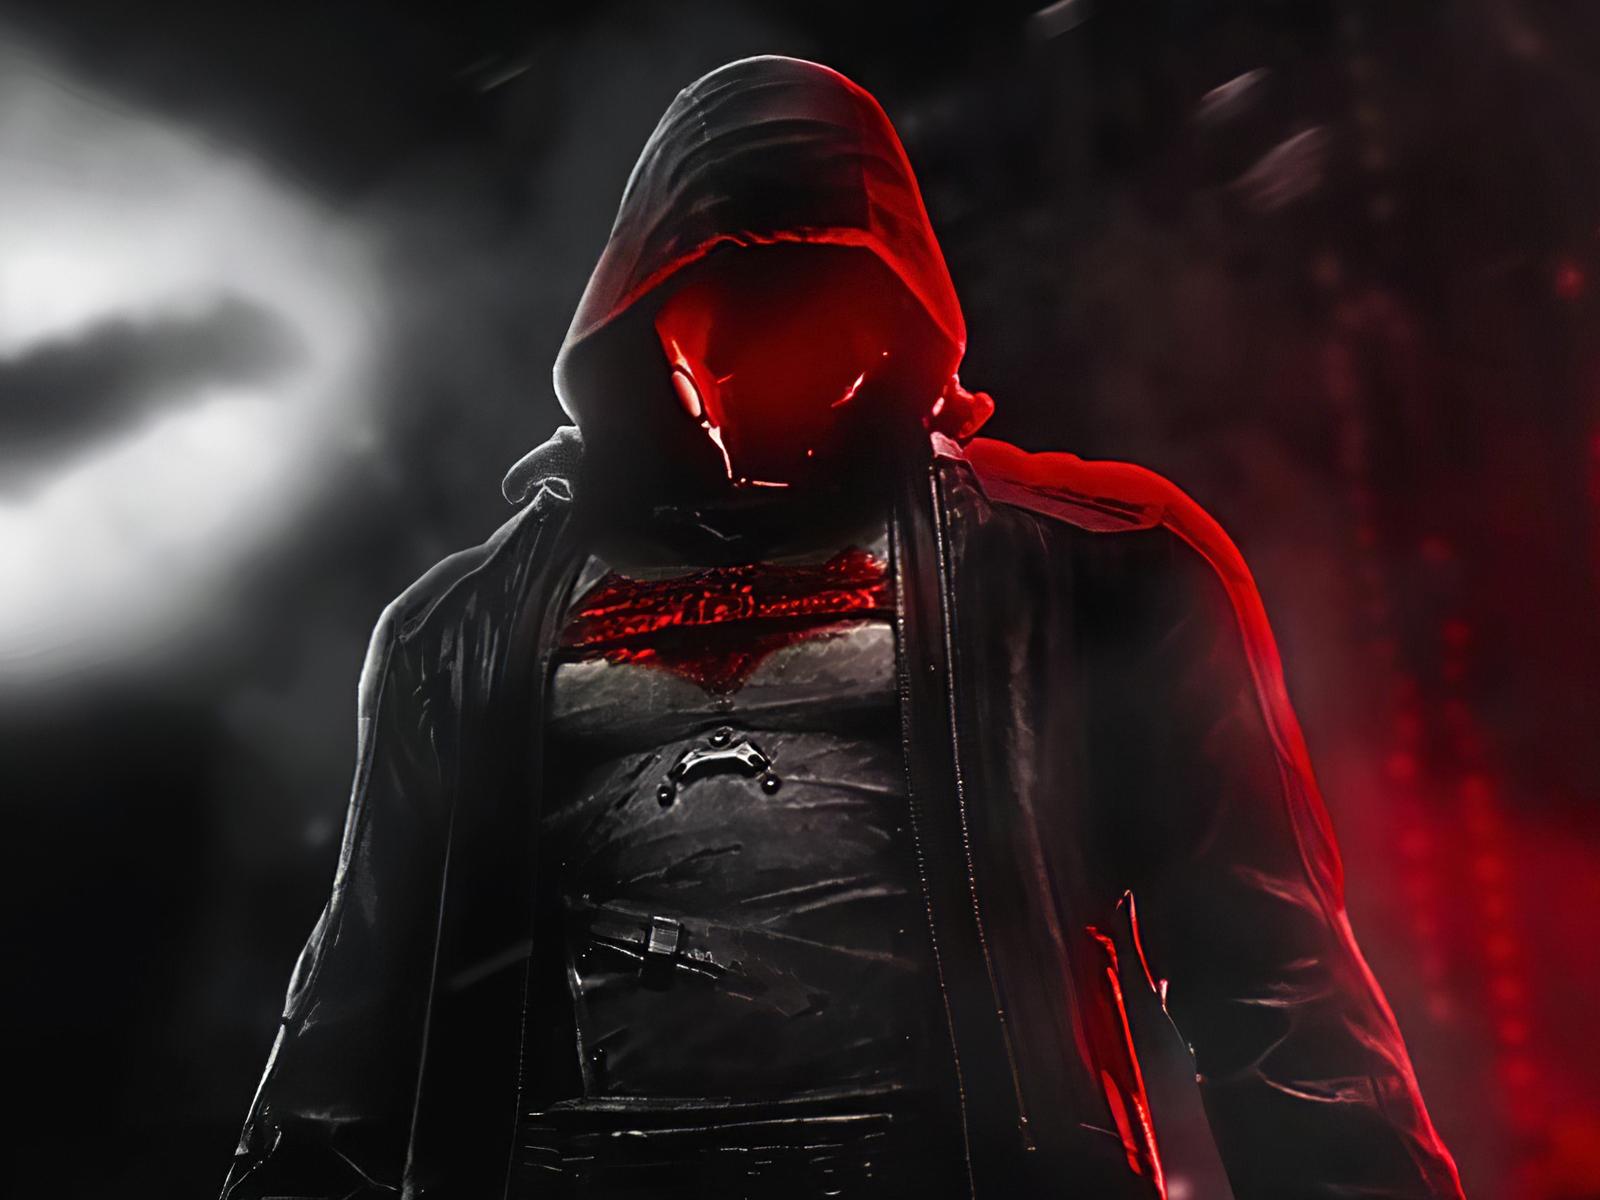 red-hood-in-the-night-9q.jpg